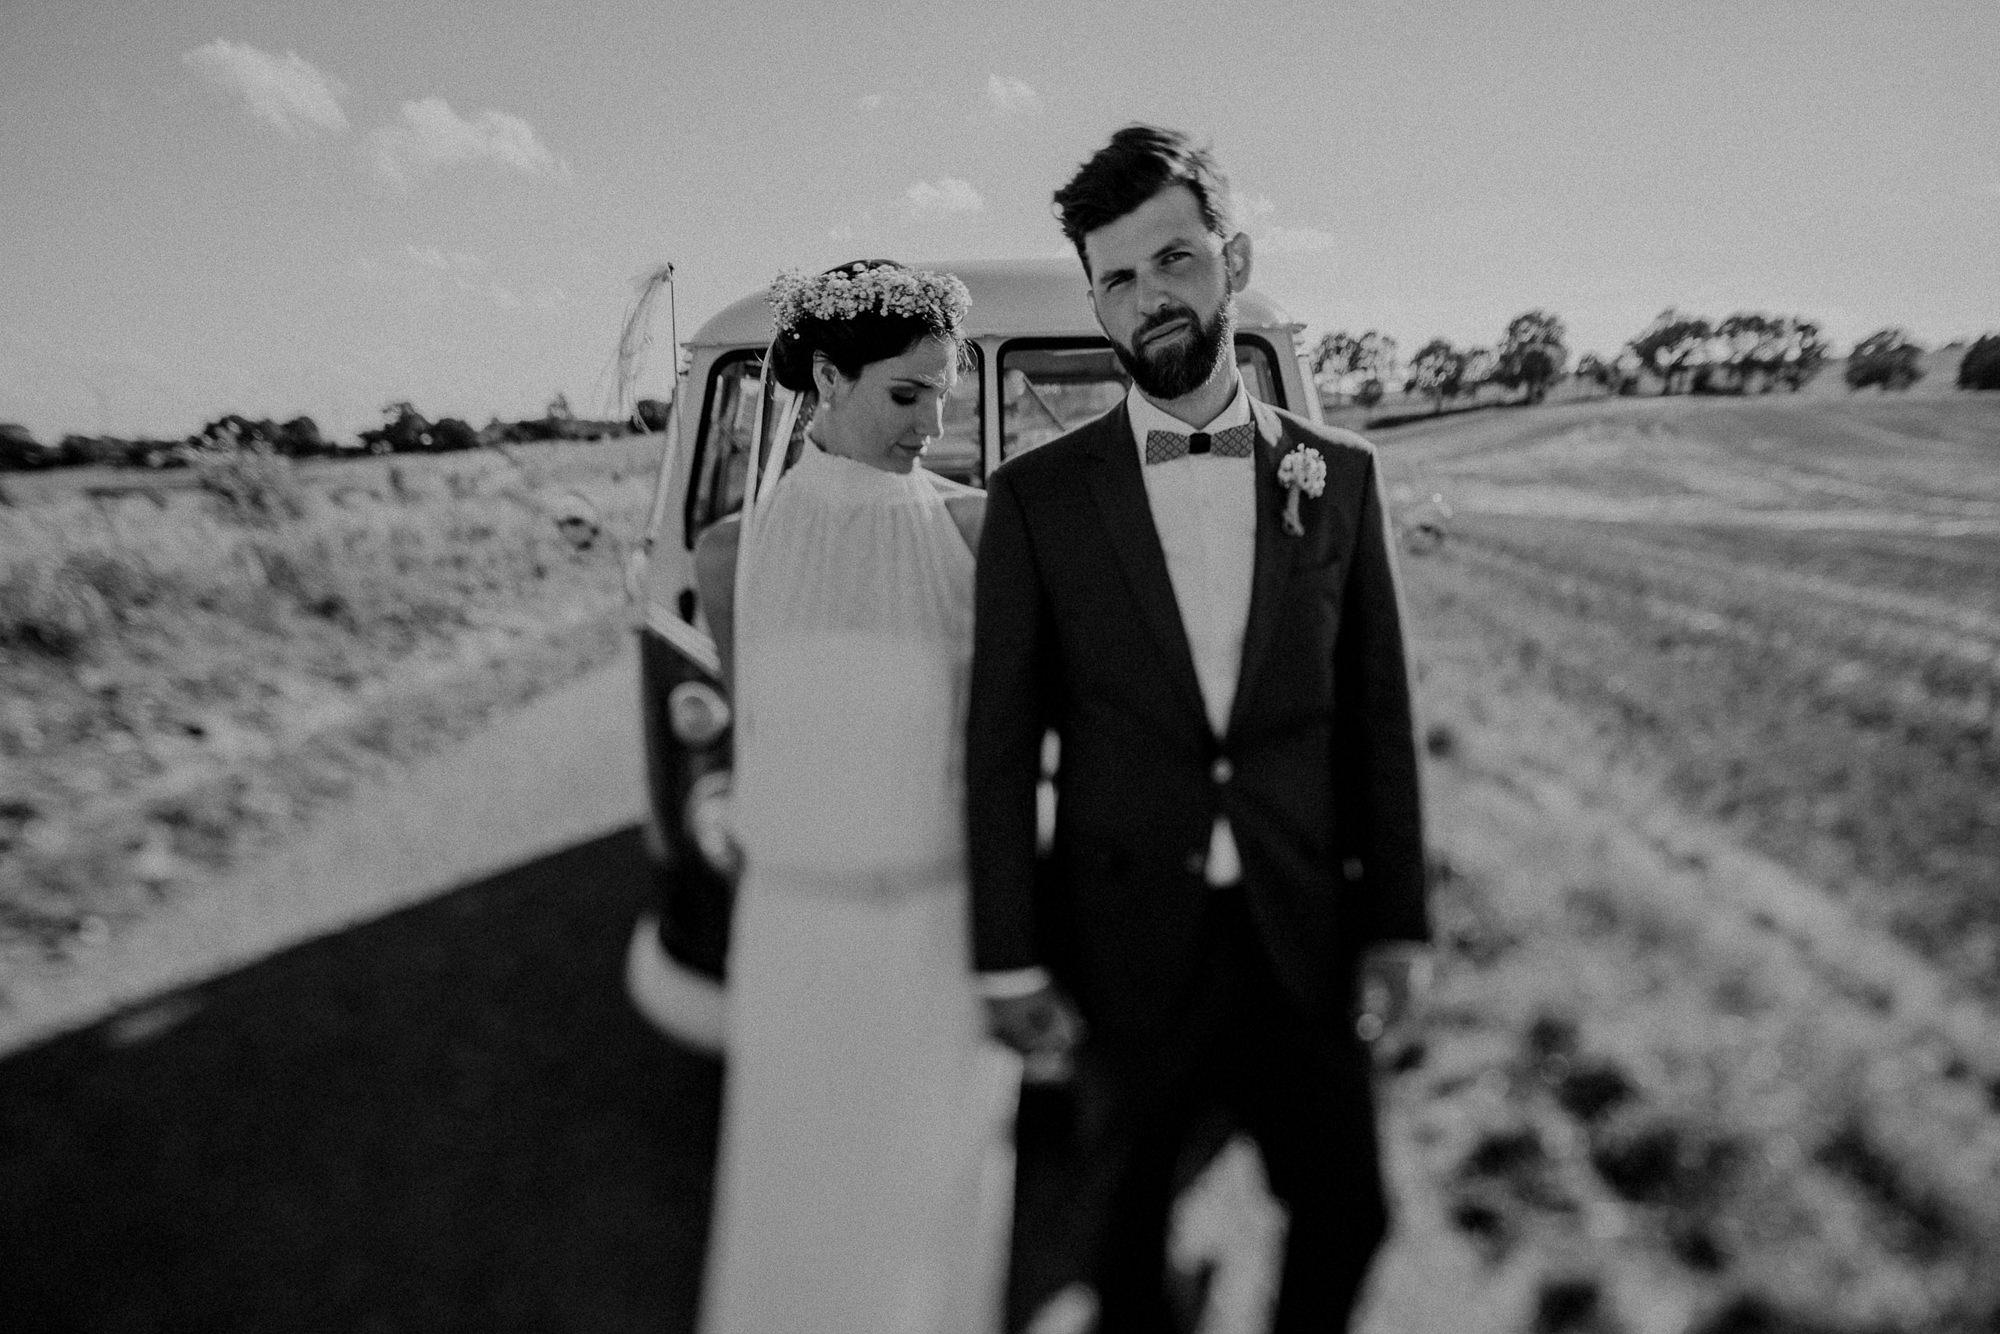 Hochzeitsfotograf-Potsdam-Tom-und-Lia-Fotografie-5DT_2797